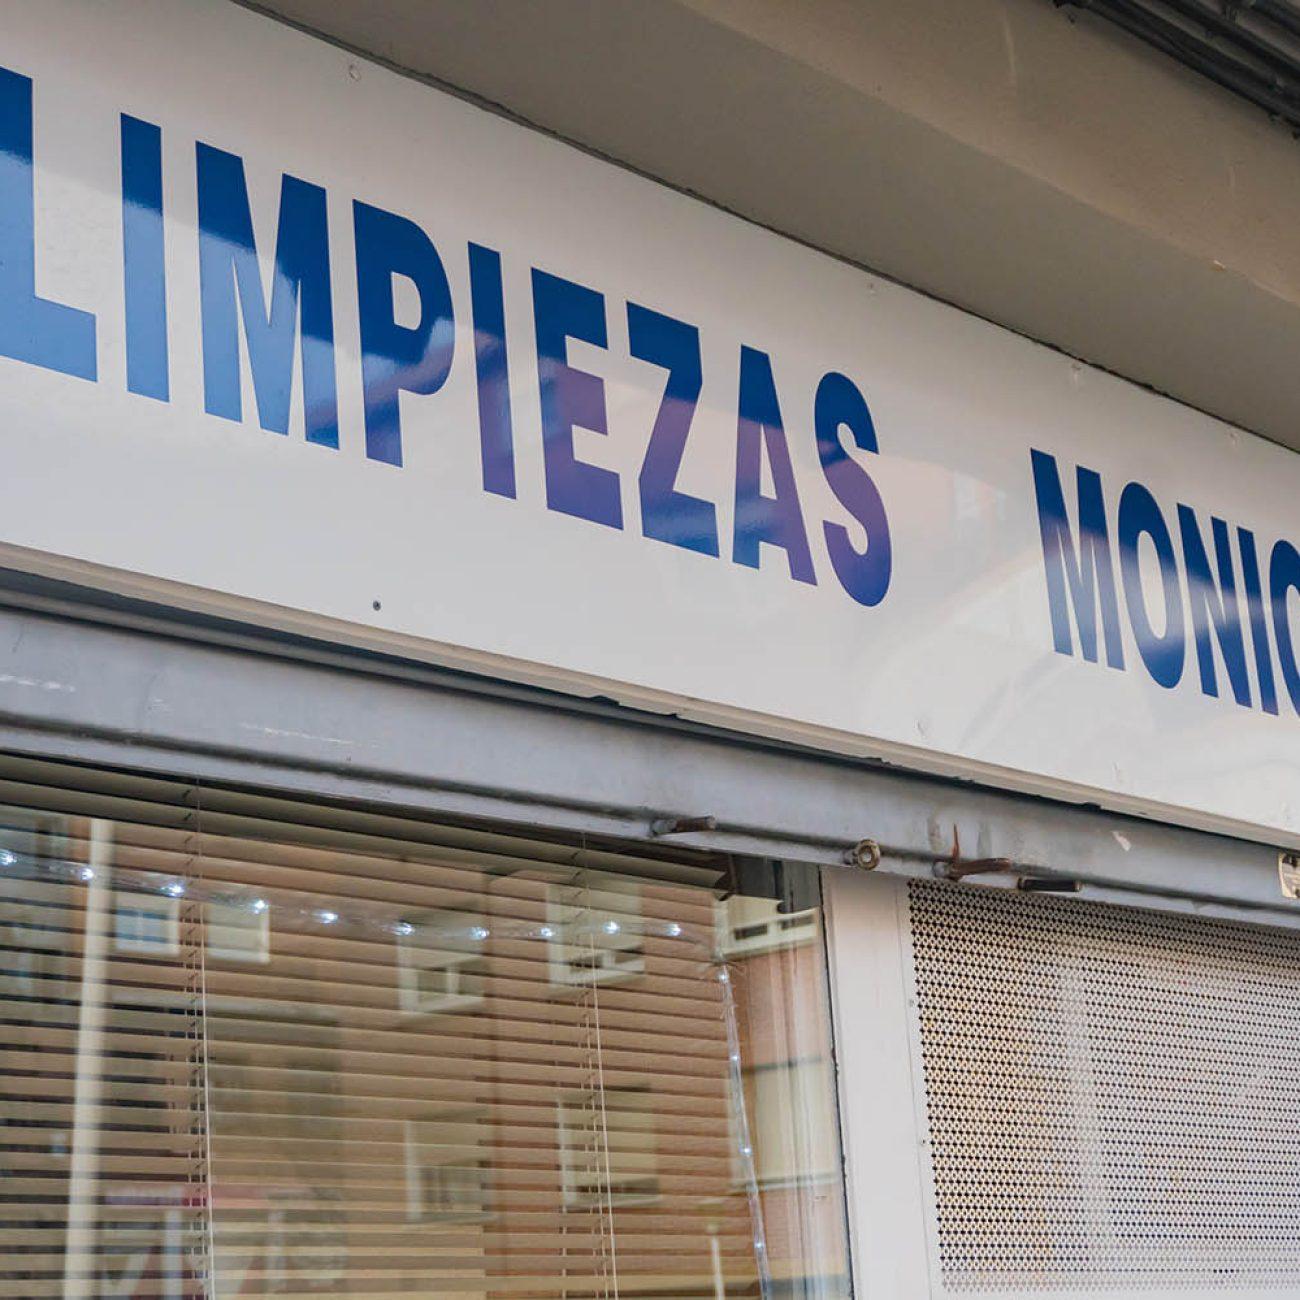 LIMPIEZAS MONICA